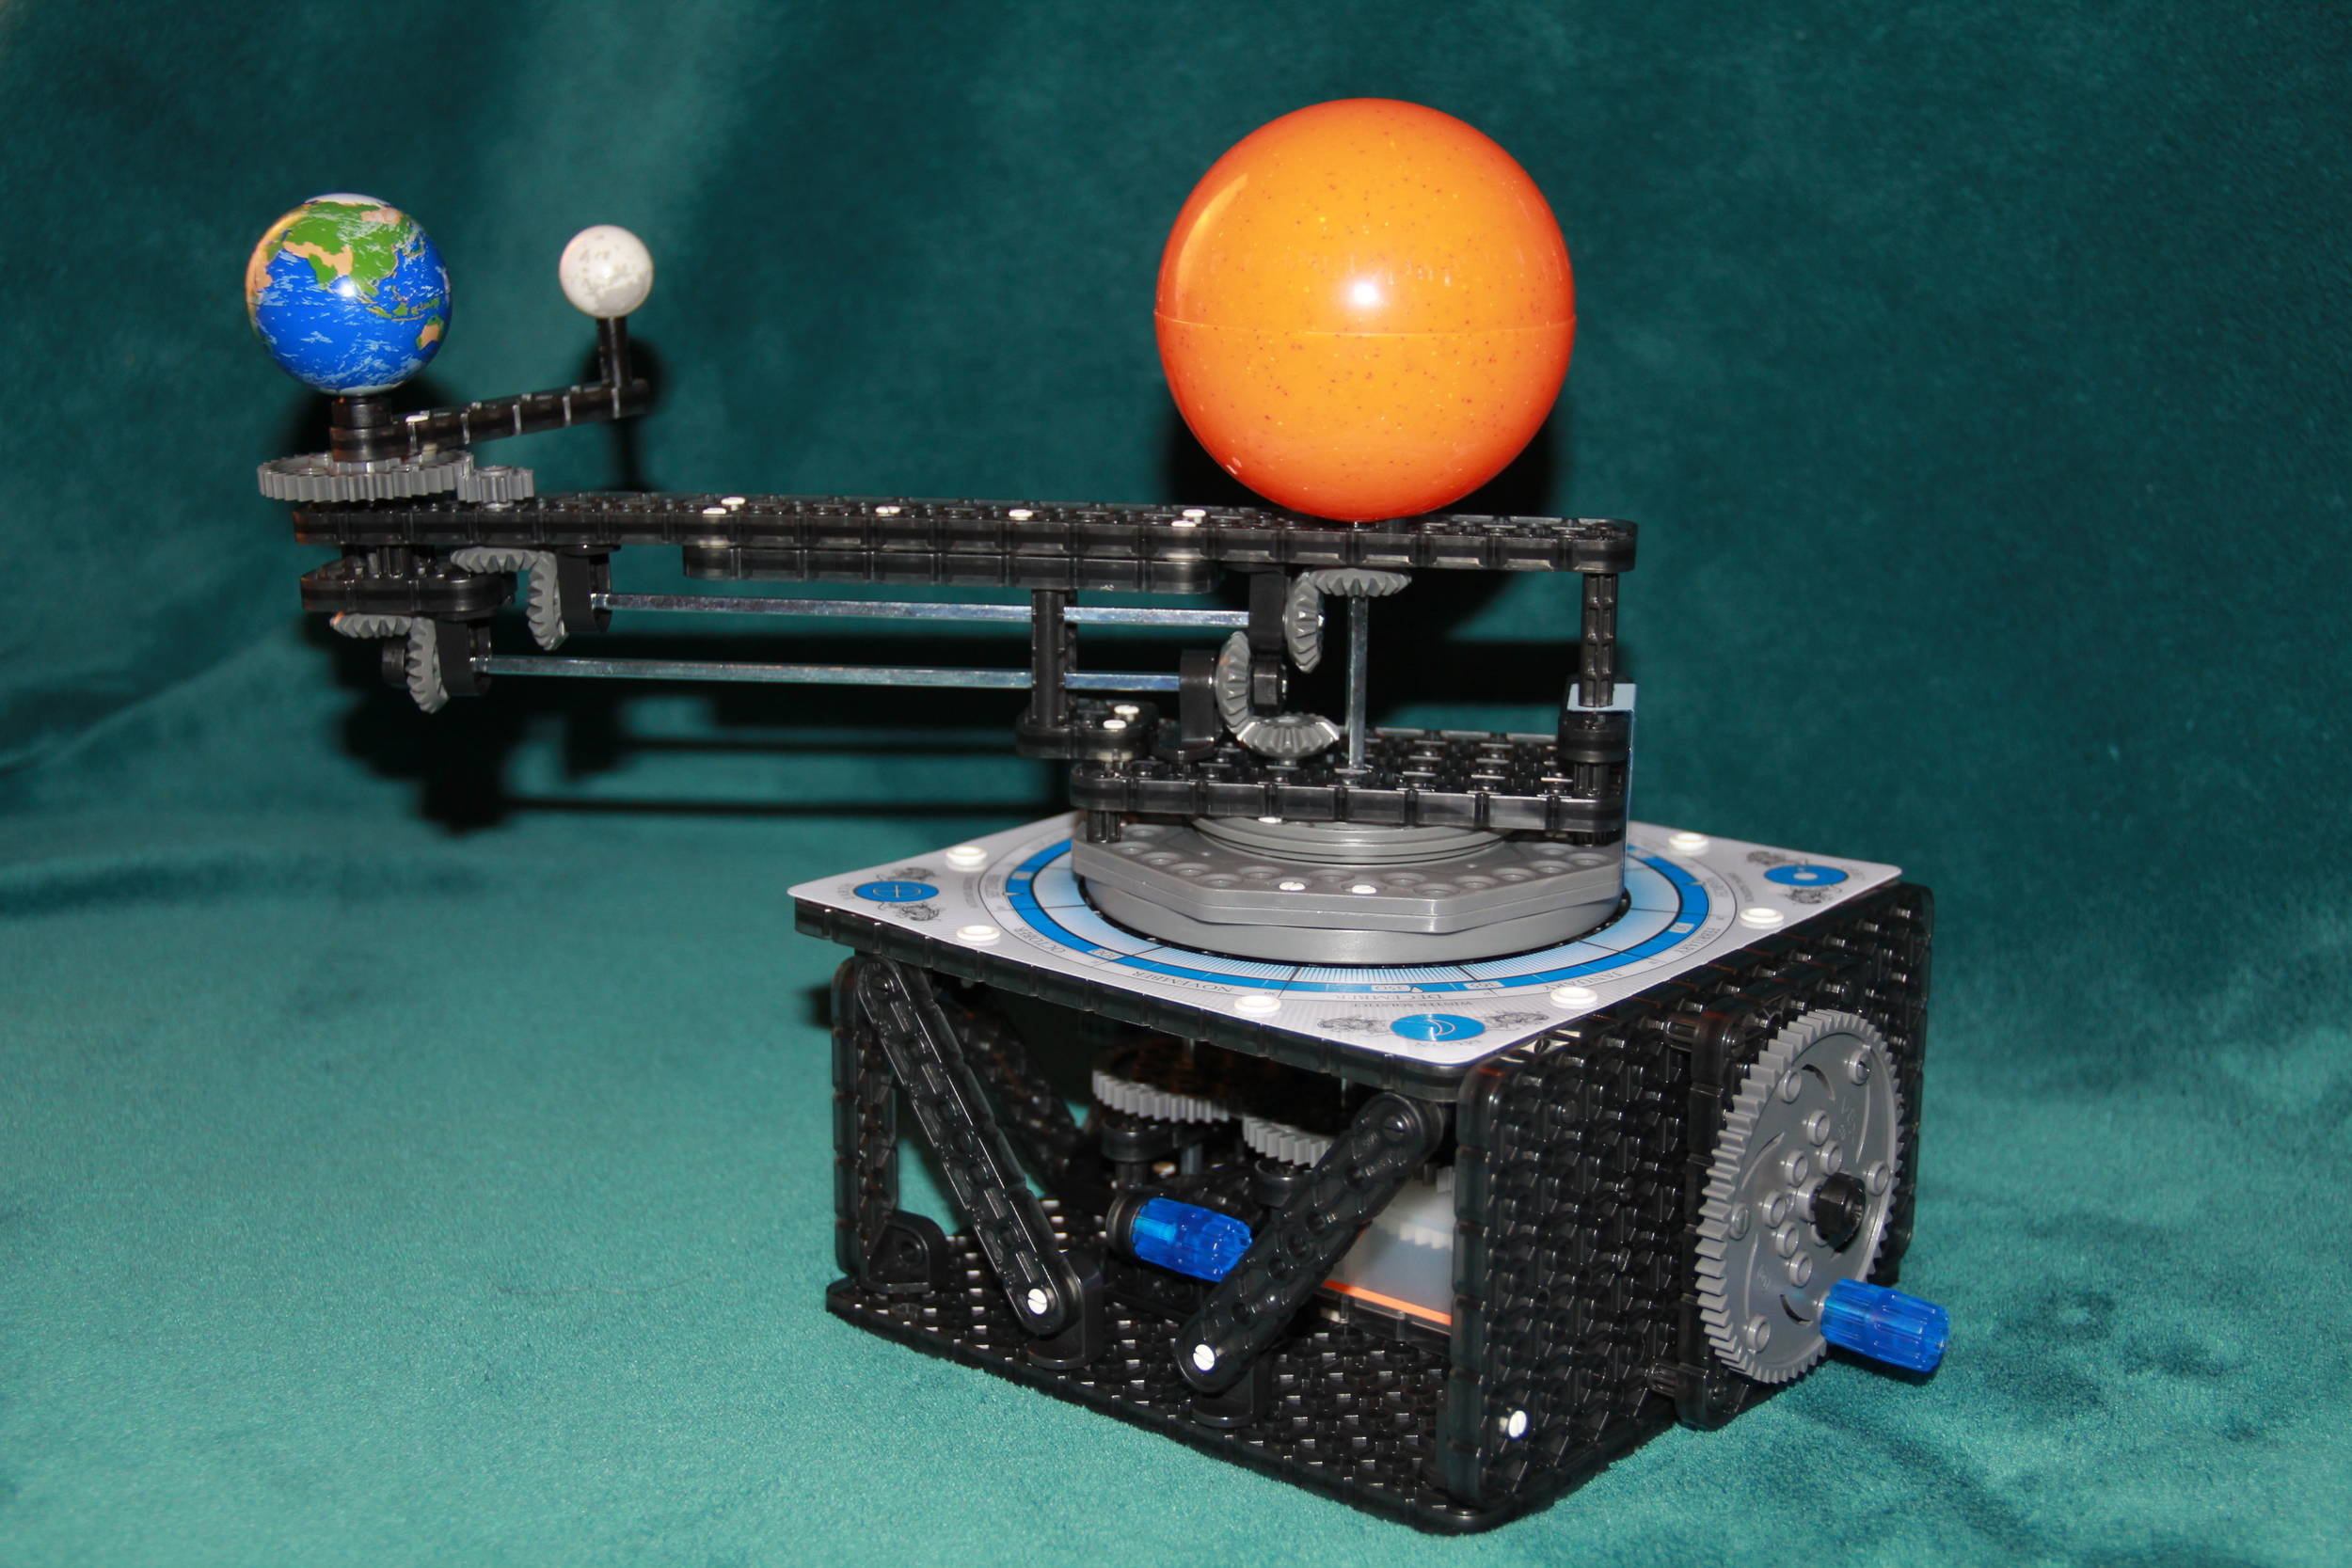 The VEX Robotics Orbit Model fully assembled.